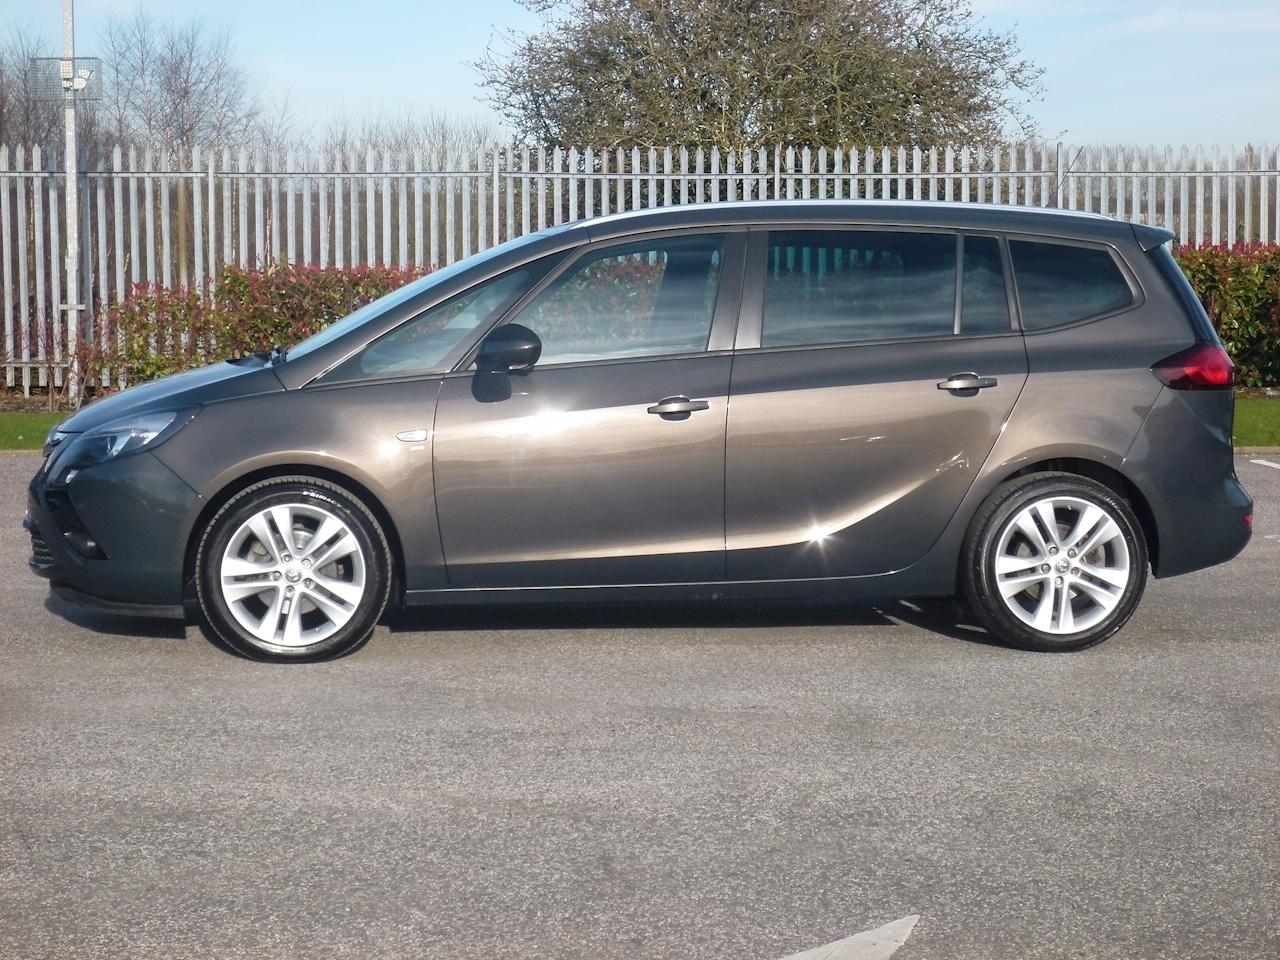 Used Vauxhall Zafira Tourer Sri 7 Seater